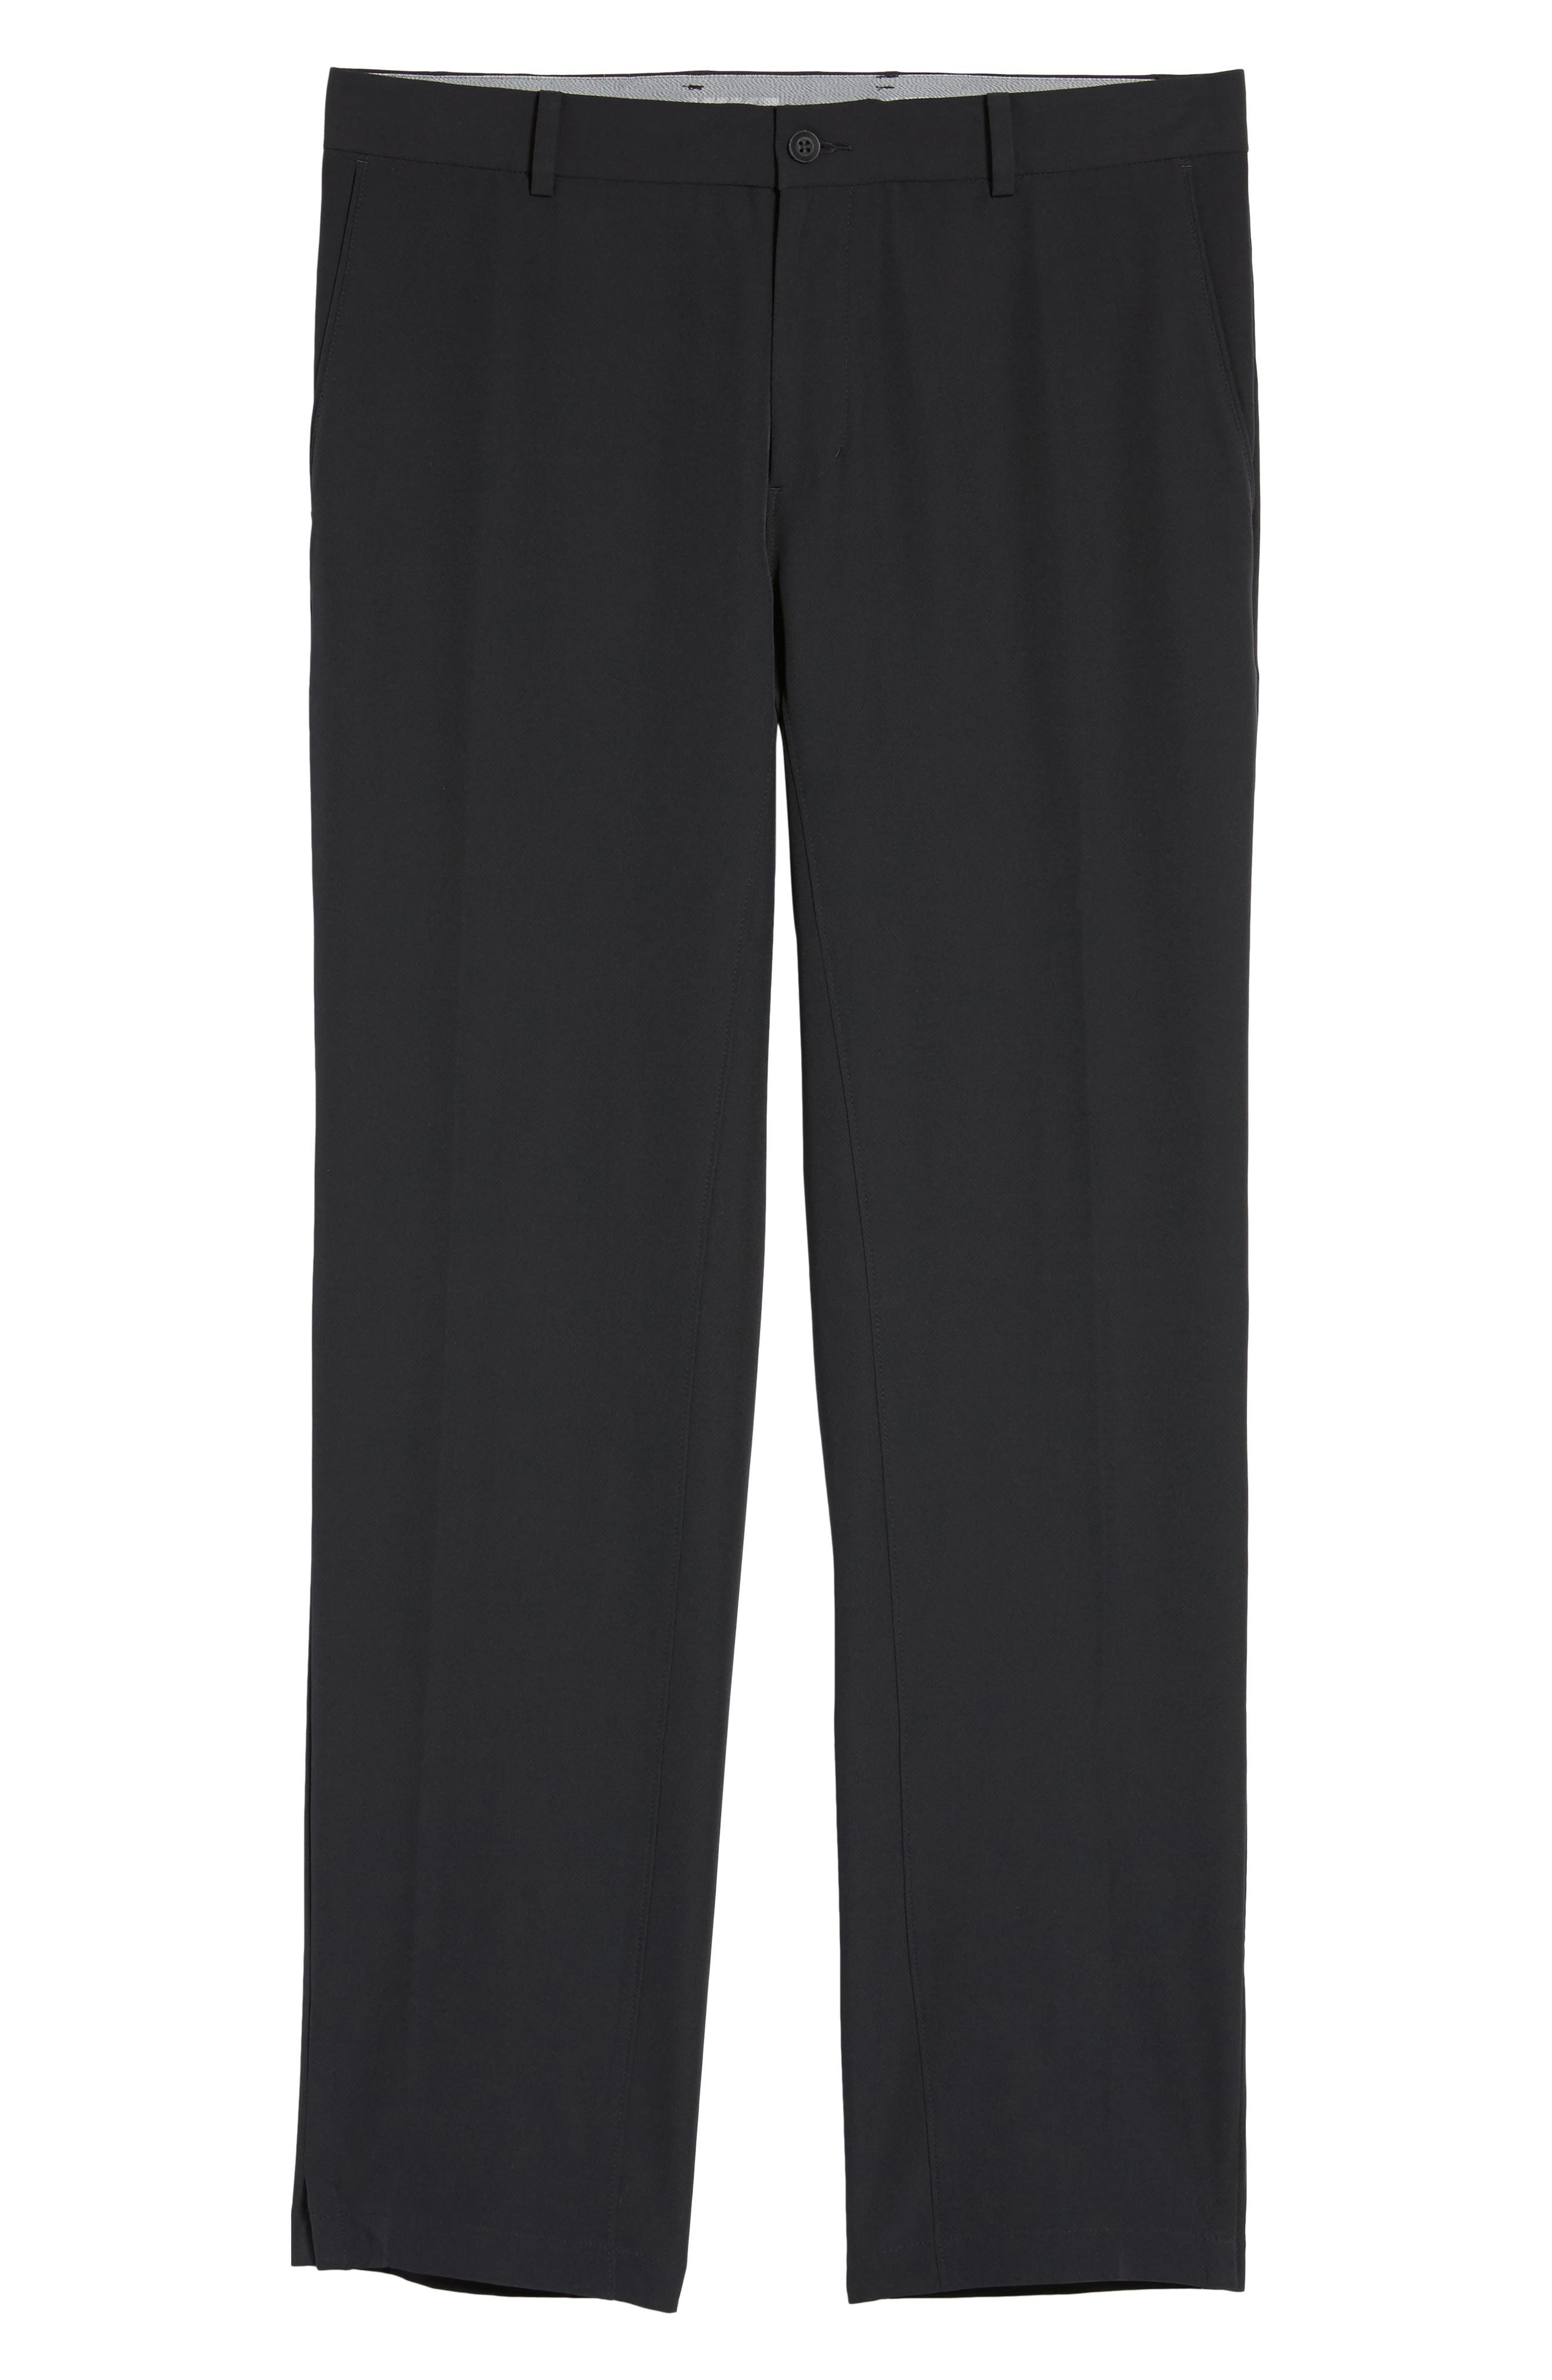 NIKE, Hybrid Flex Golf Pants, Alternate thumbnail 7, color, 010